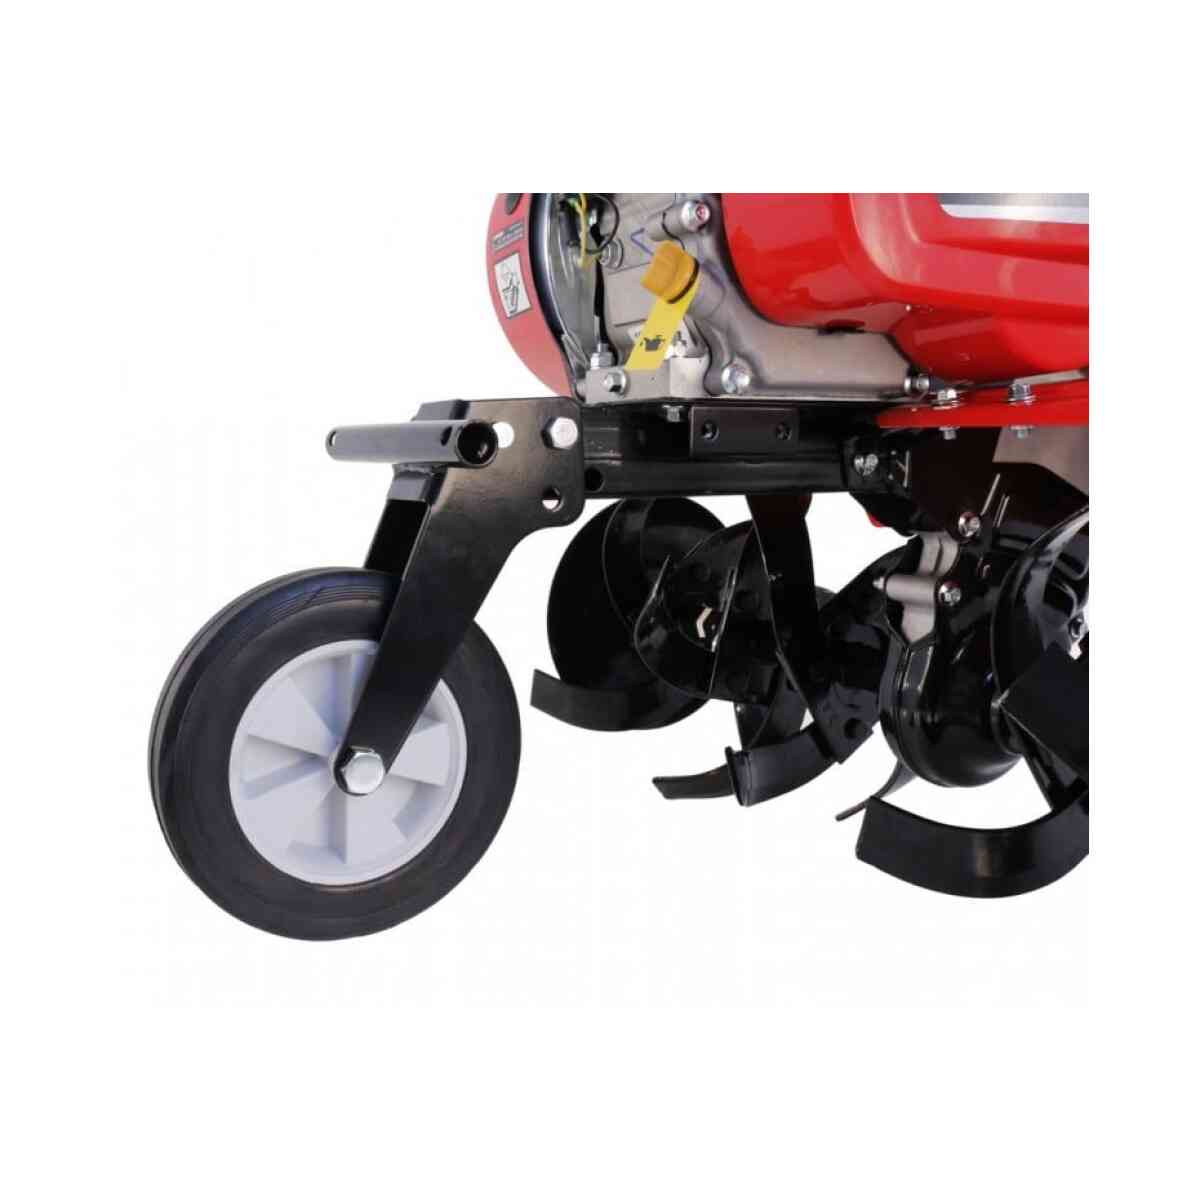 motocultor loncin lc750 7cp o mac.ro 3 41